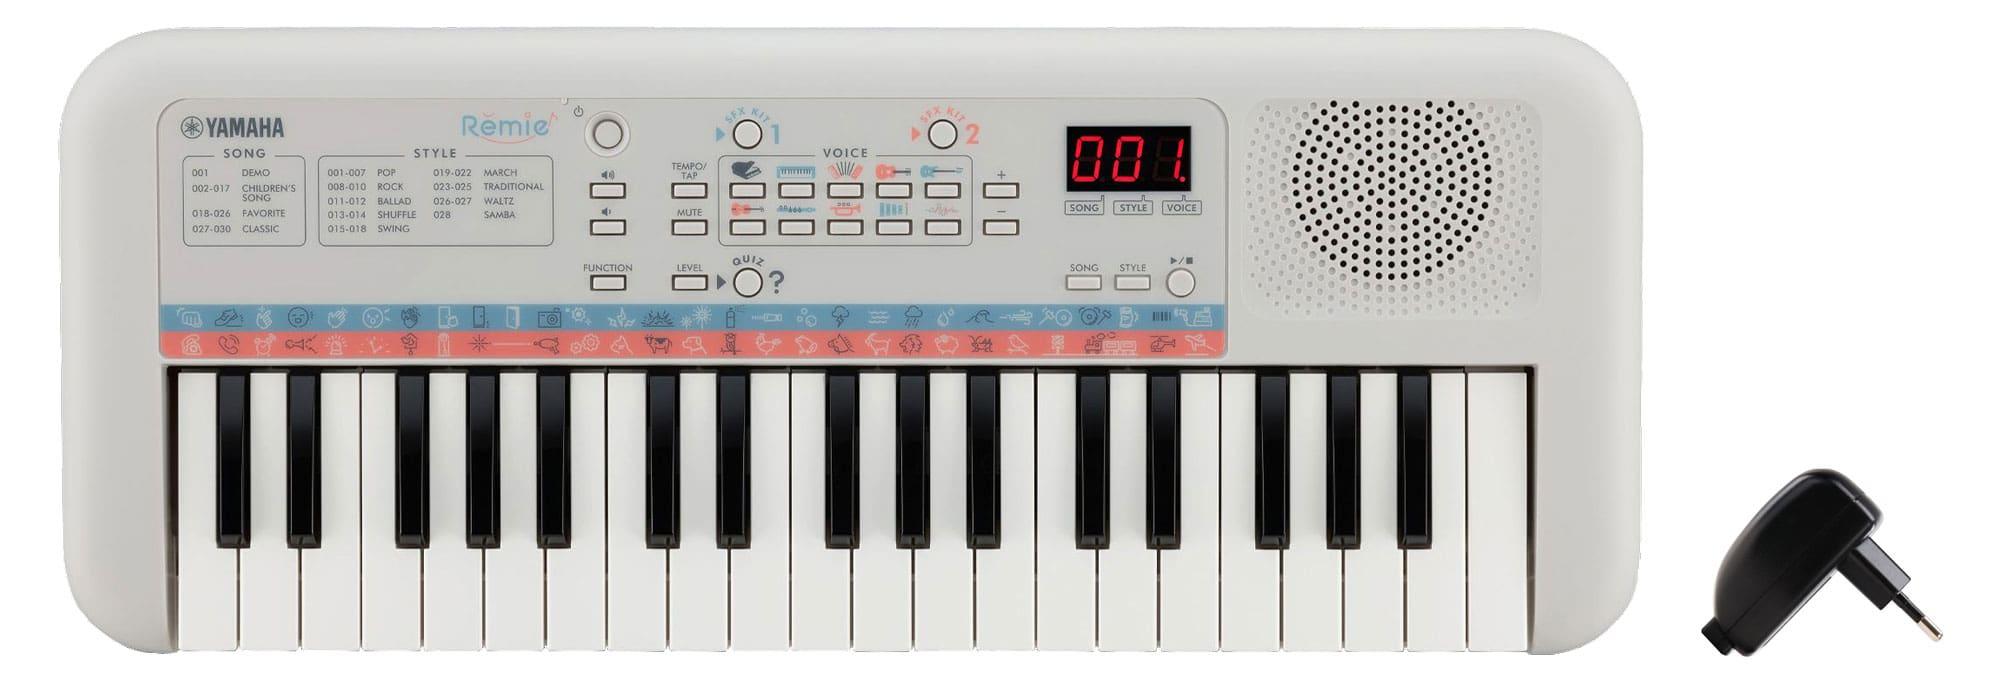 Homekeyboards - Yamaha Remie PSS E30 Keyboard Set inkl. USB Netzteil - Onlineshop Musikhaus Kirstein